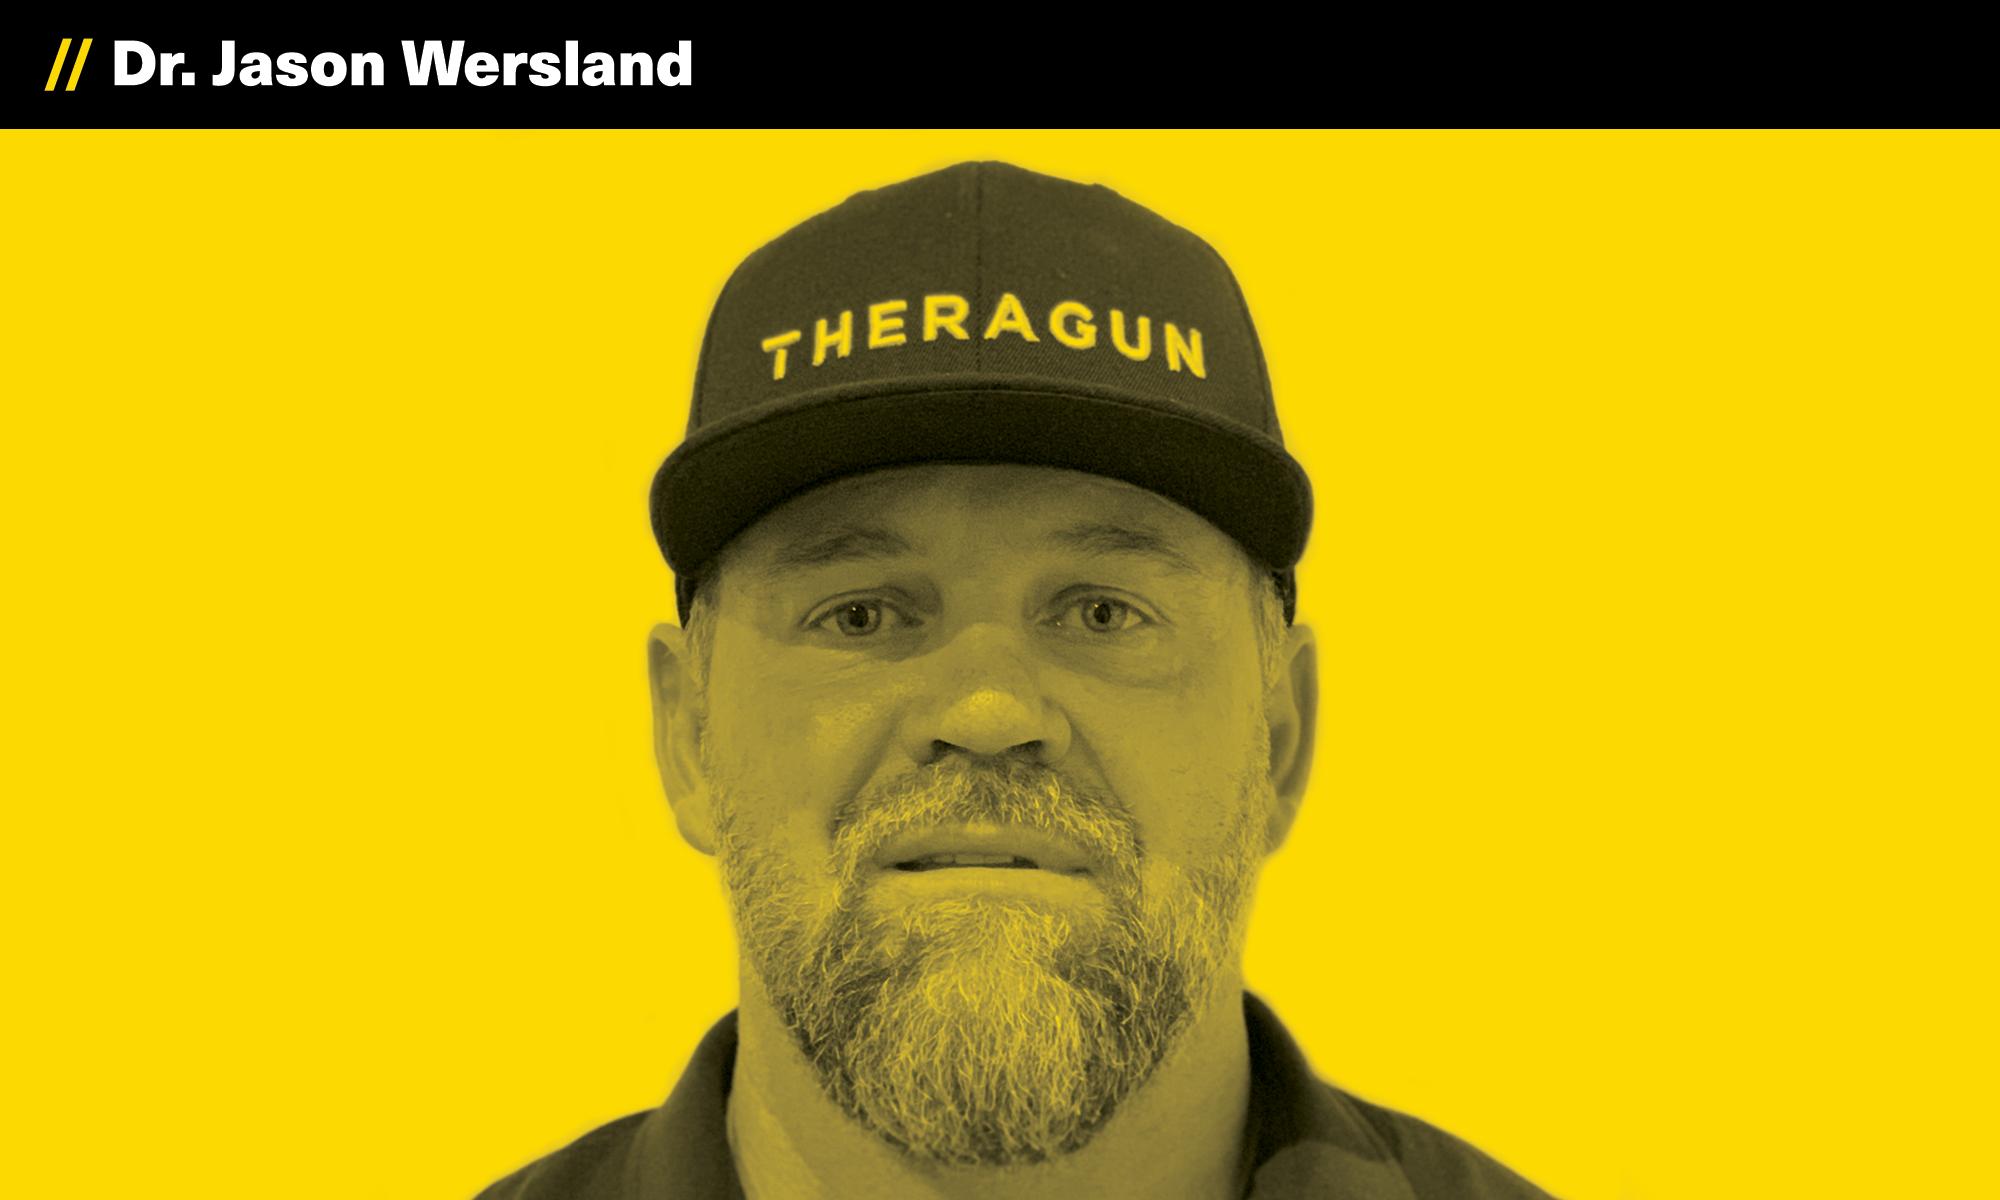 Dr Jason Wersland, Theragun, The Founder Hour, Podcast